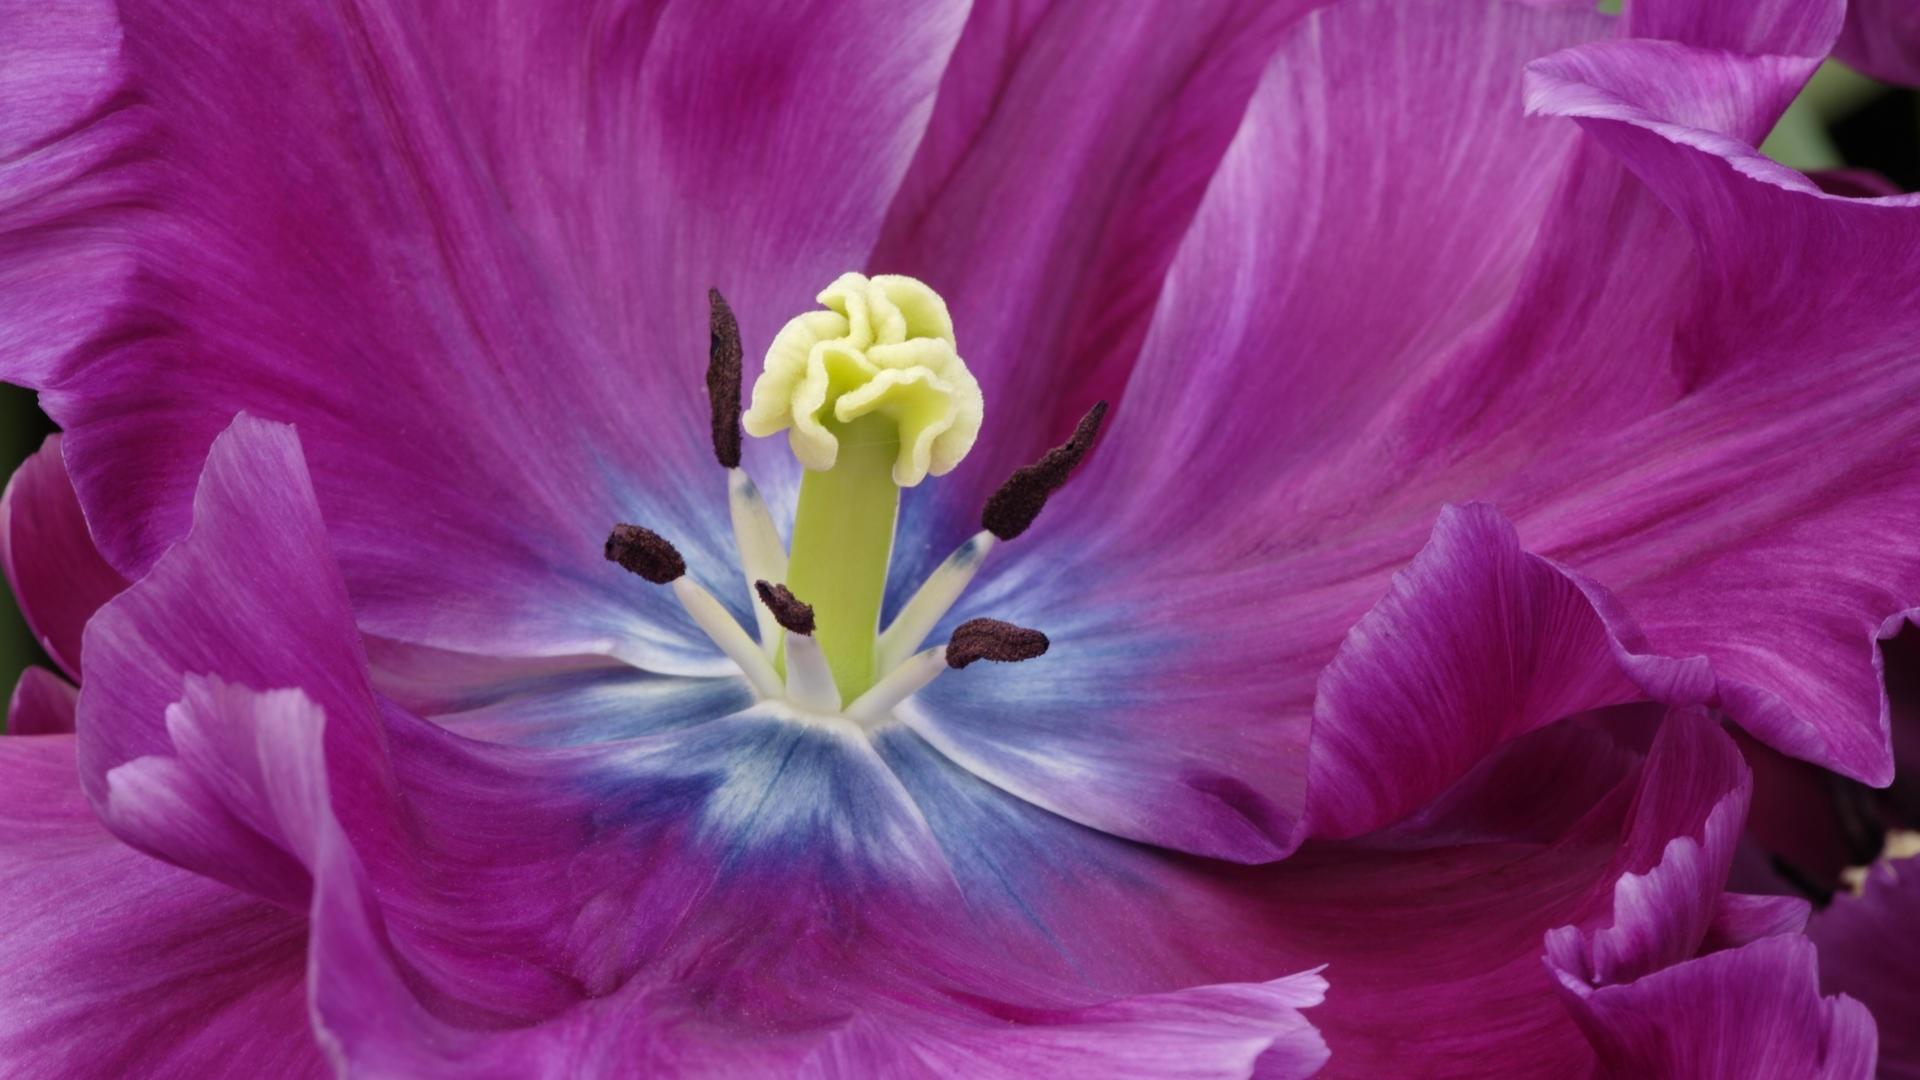 Image by Debbie Craft - Close-up of single purple tulip, Kuekenhof Gardens, Netherlands https://www.google.com.au/url?sa=i&rct=j&q=&esrc=s&source=images&cd=&ved=0ahUKEwjsivvnqKDRAhXCl5QKHQr8APAQjhwIBQ&url=http%3A%2F%2Fdebbiecraft.ca%2F&psig=AFQjCNFdx-vpLDxNw9jvXvh79taP_VW12A&ust=1483338501158697